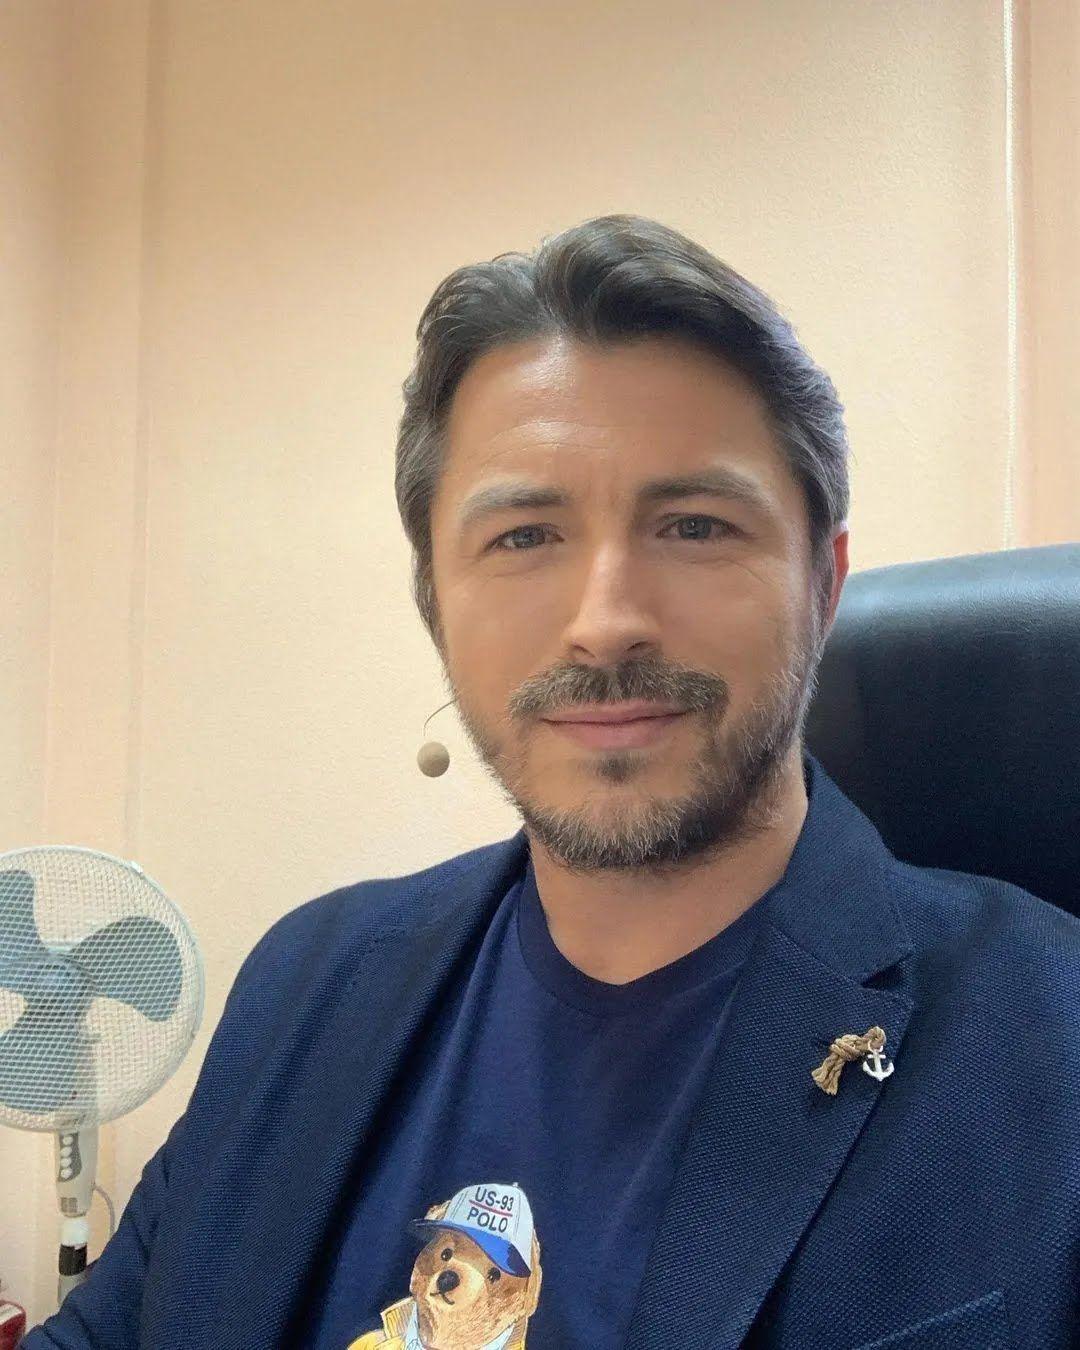 Сергій Притула – український телеведучий